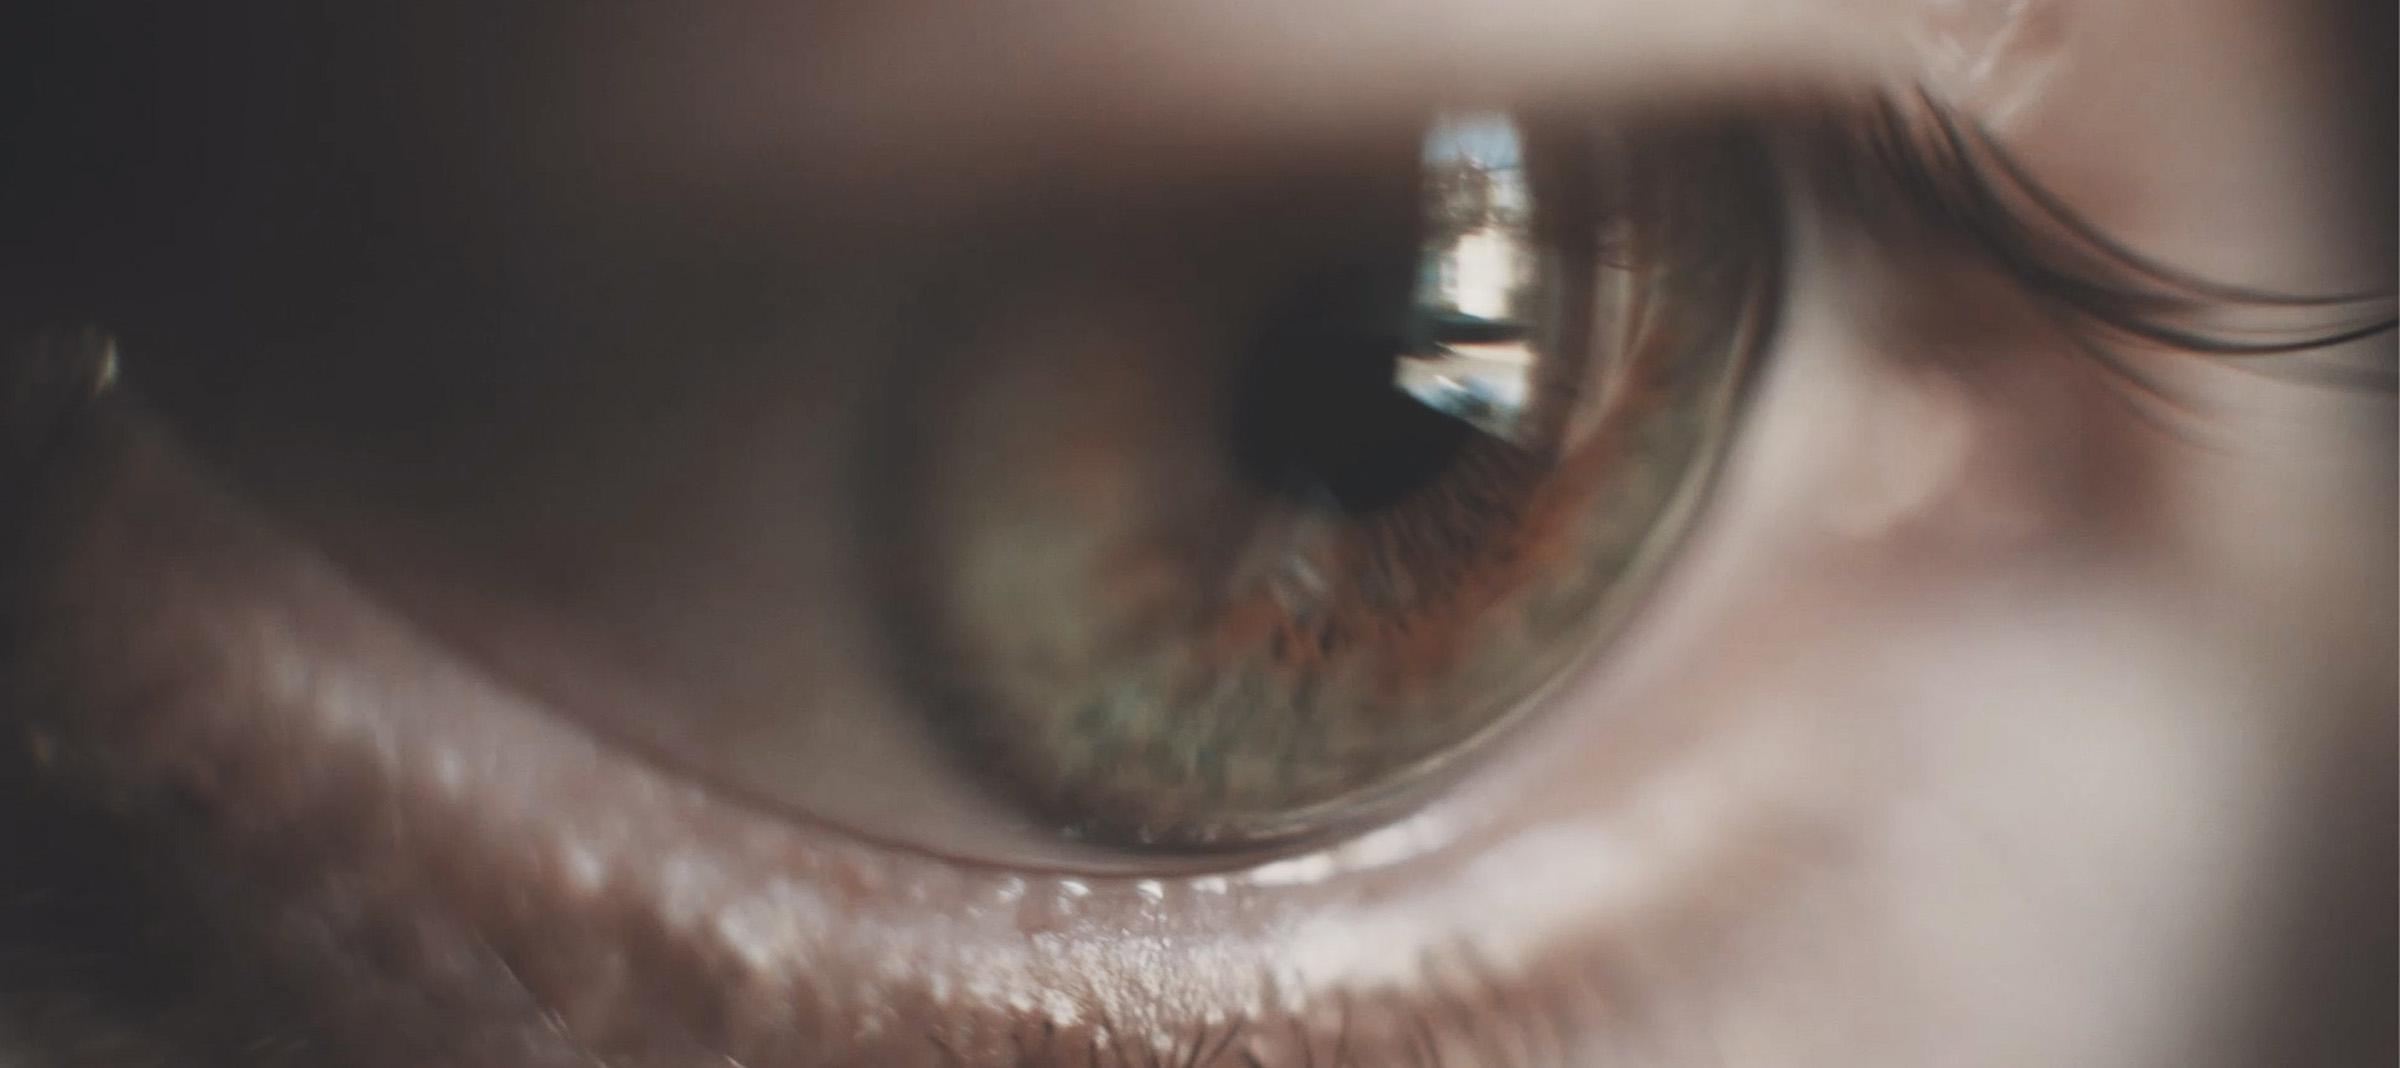 big-american-story-eye.jpg